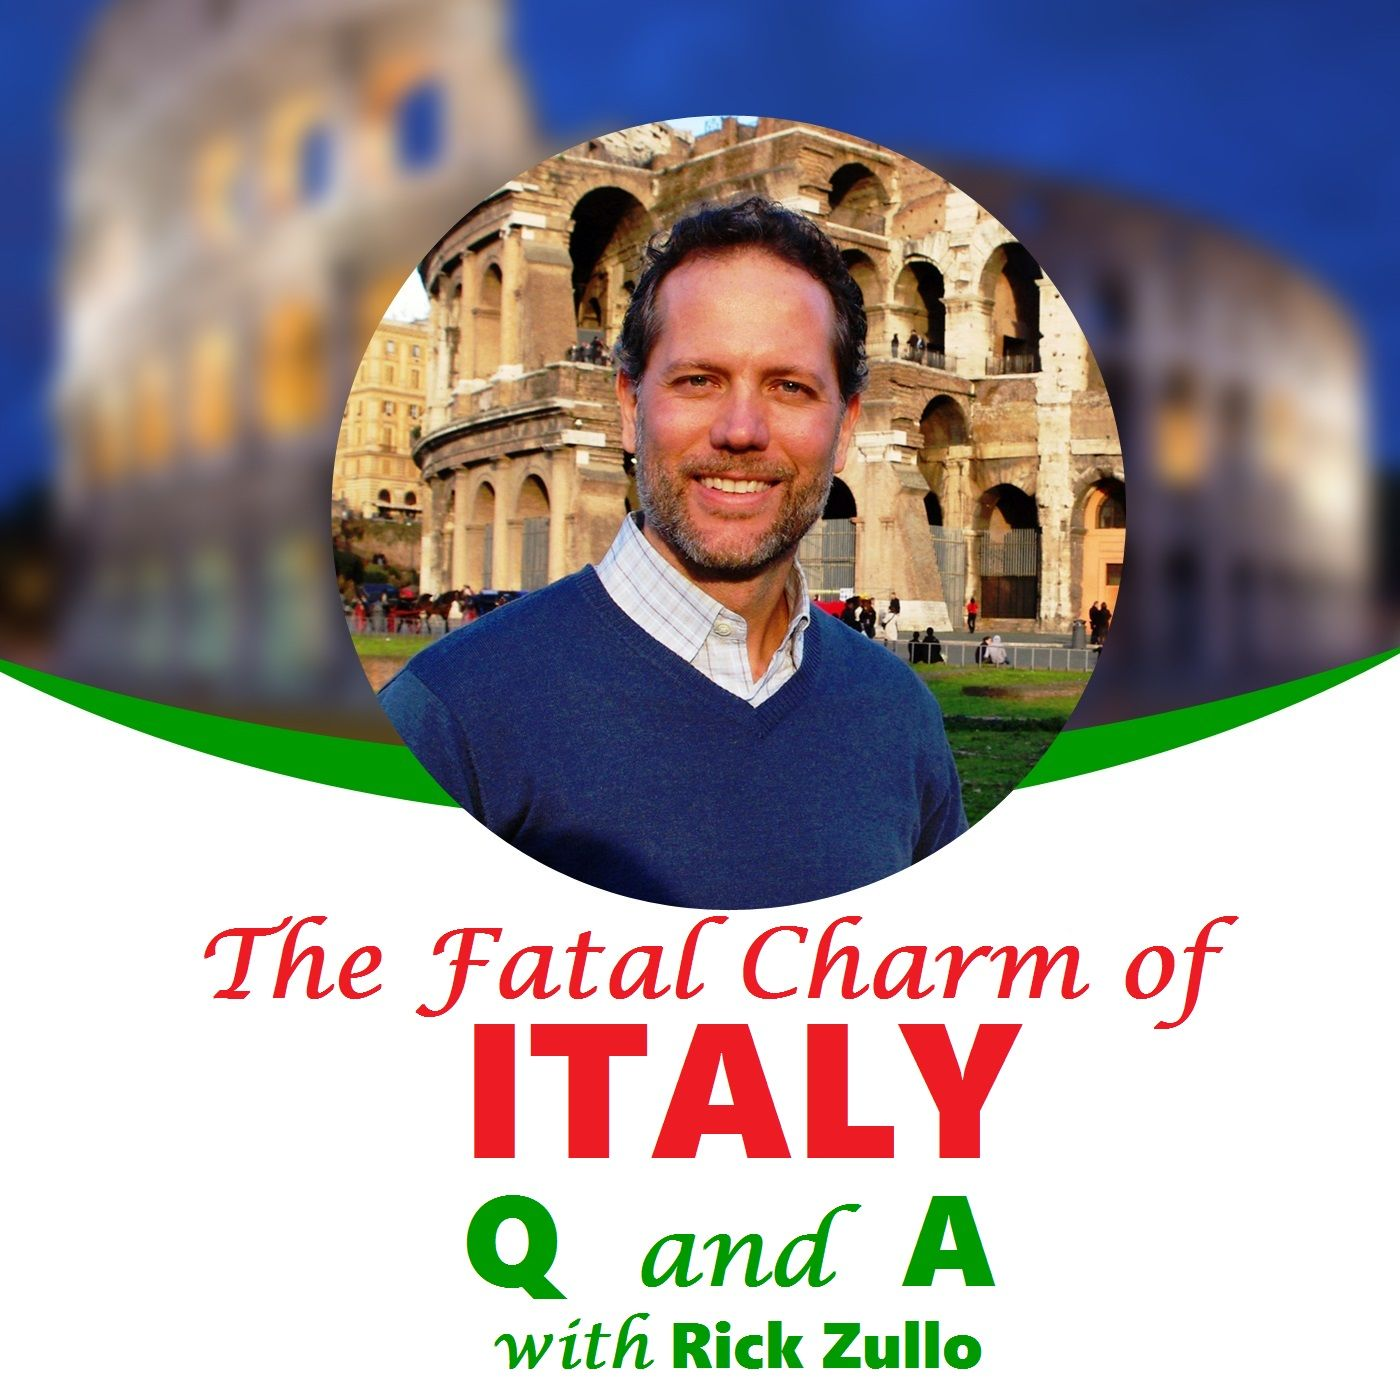 Rick Zullo